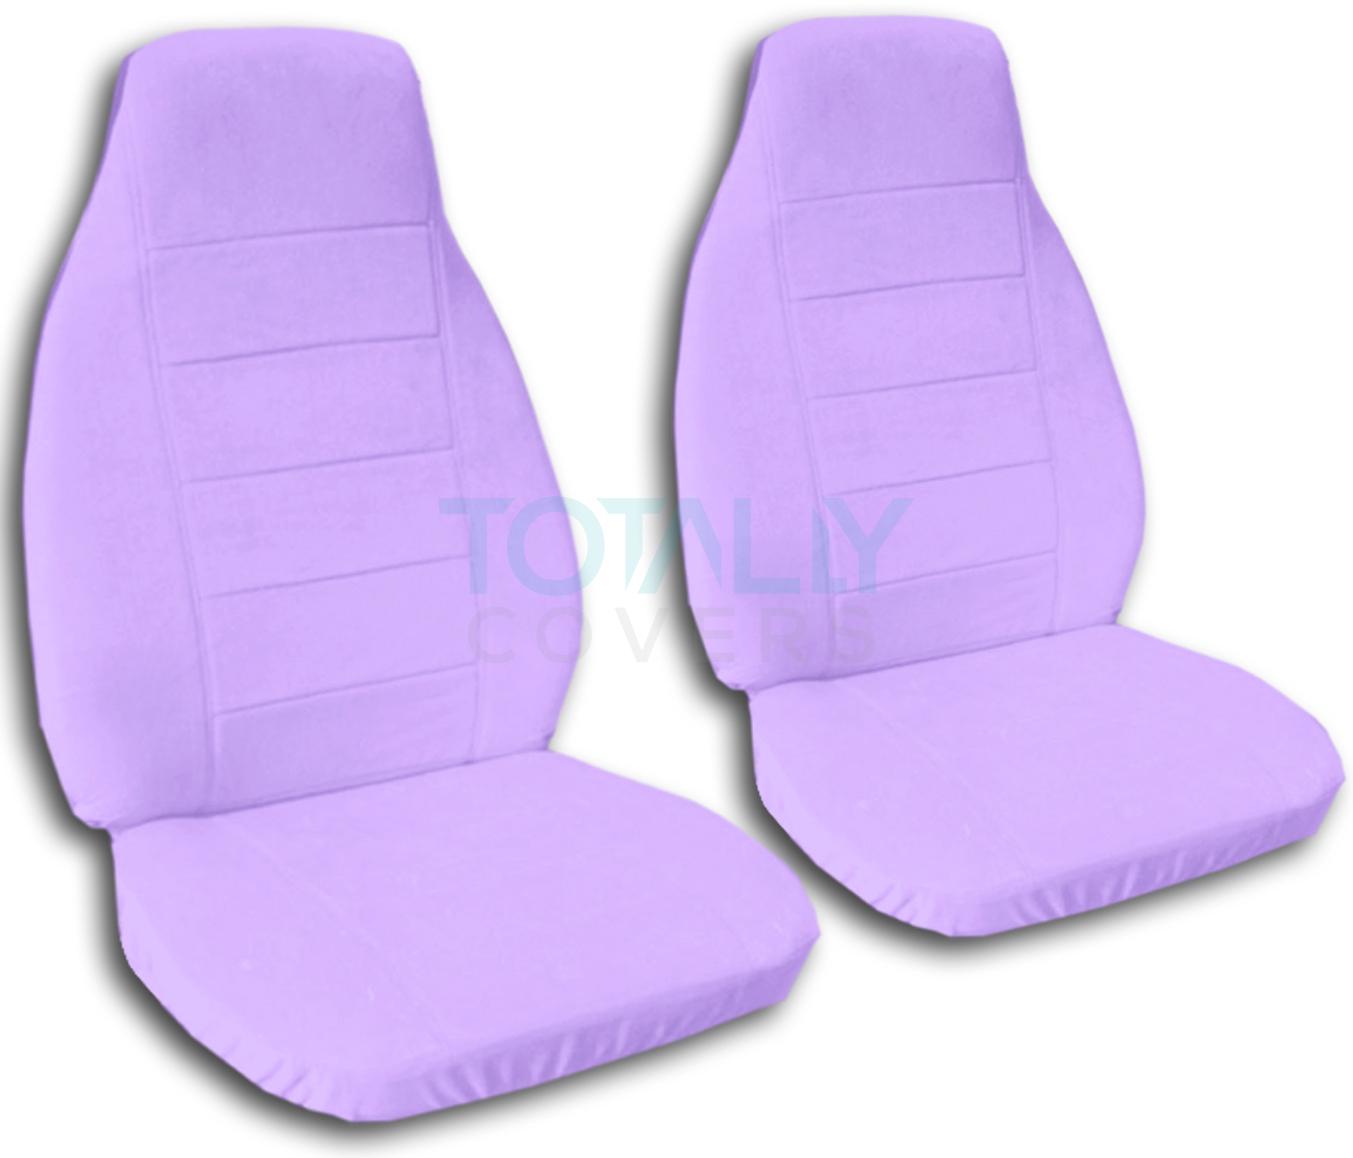 solid color car seat covers front semi custom black gray brown blue red pink ebay. Black Bedroom Furniture Sets. Home Design Ideas